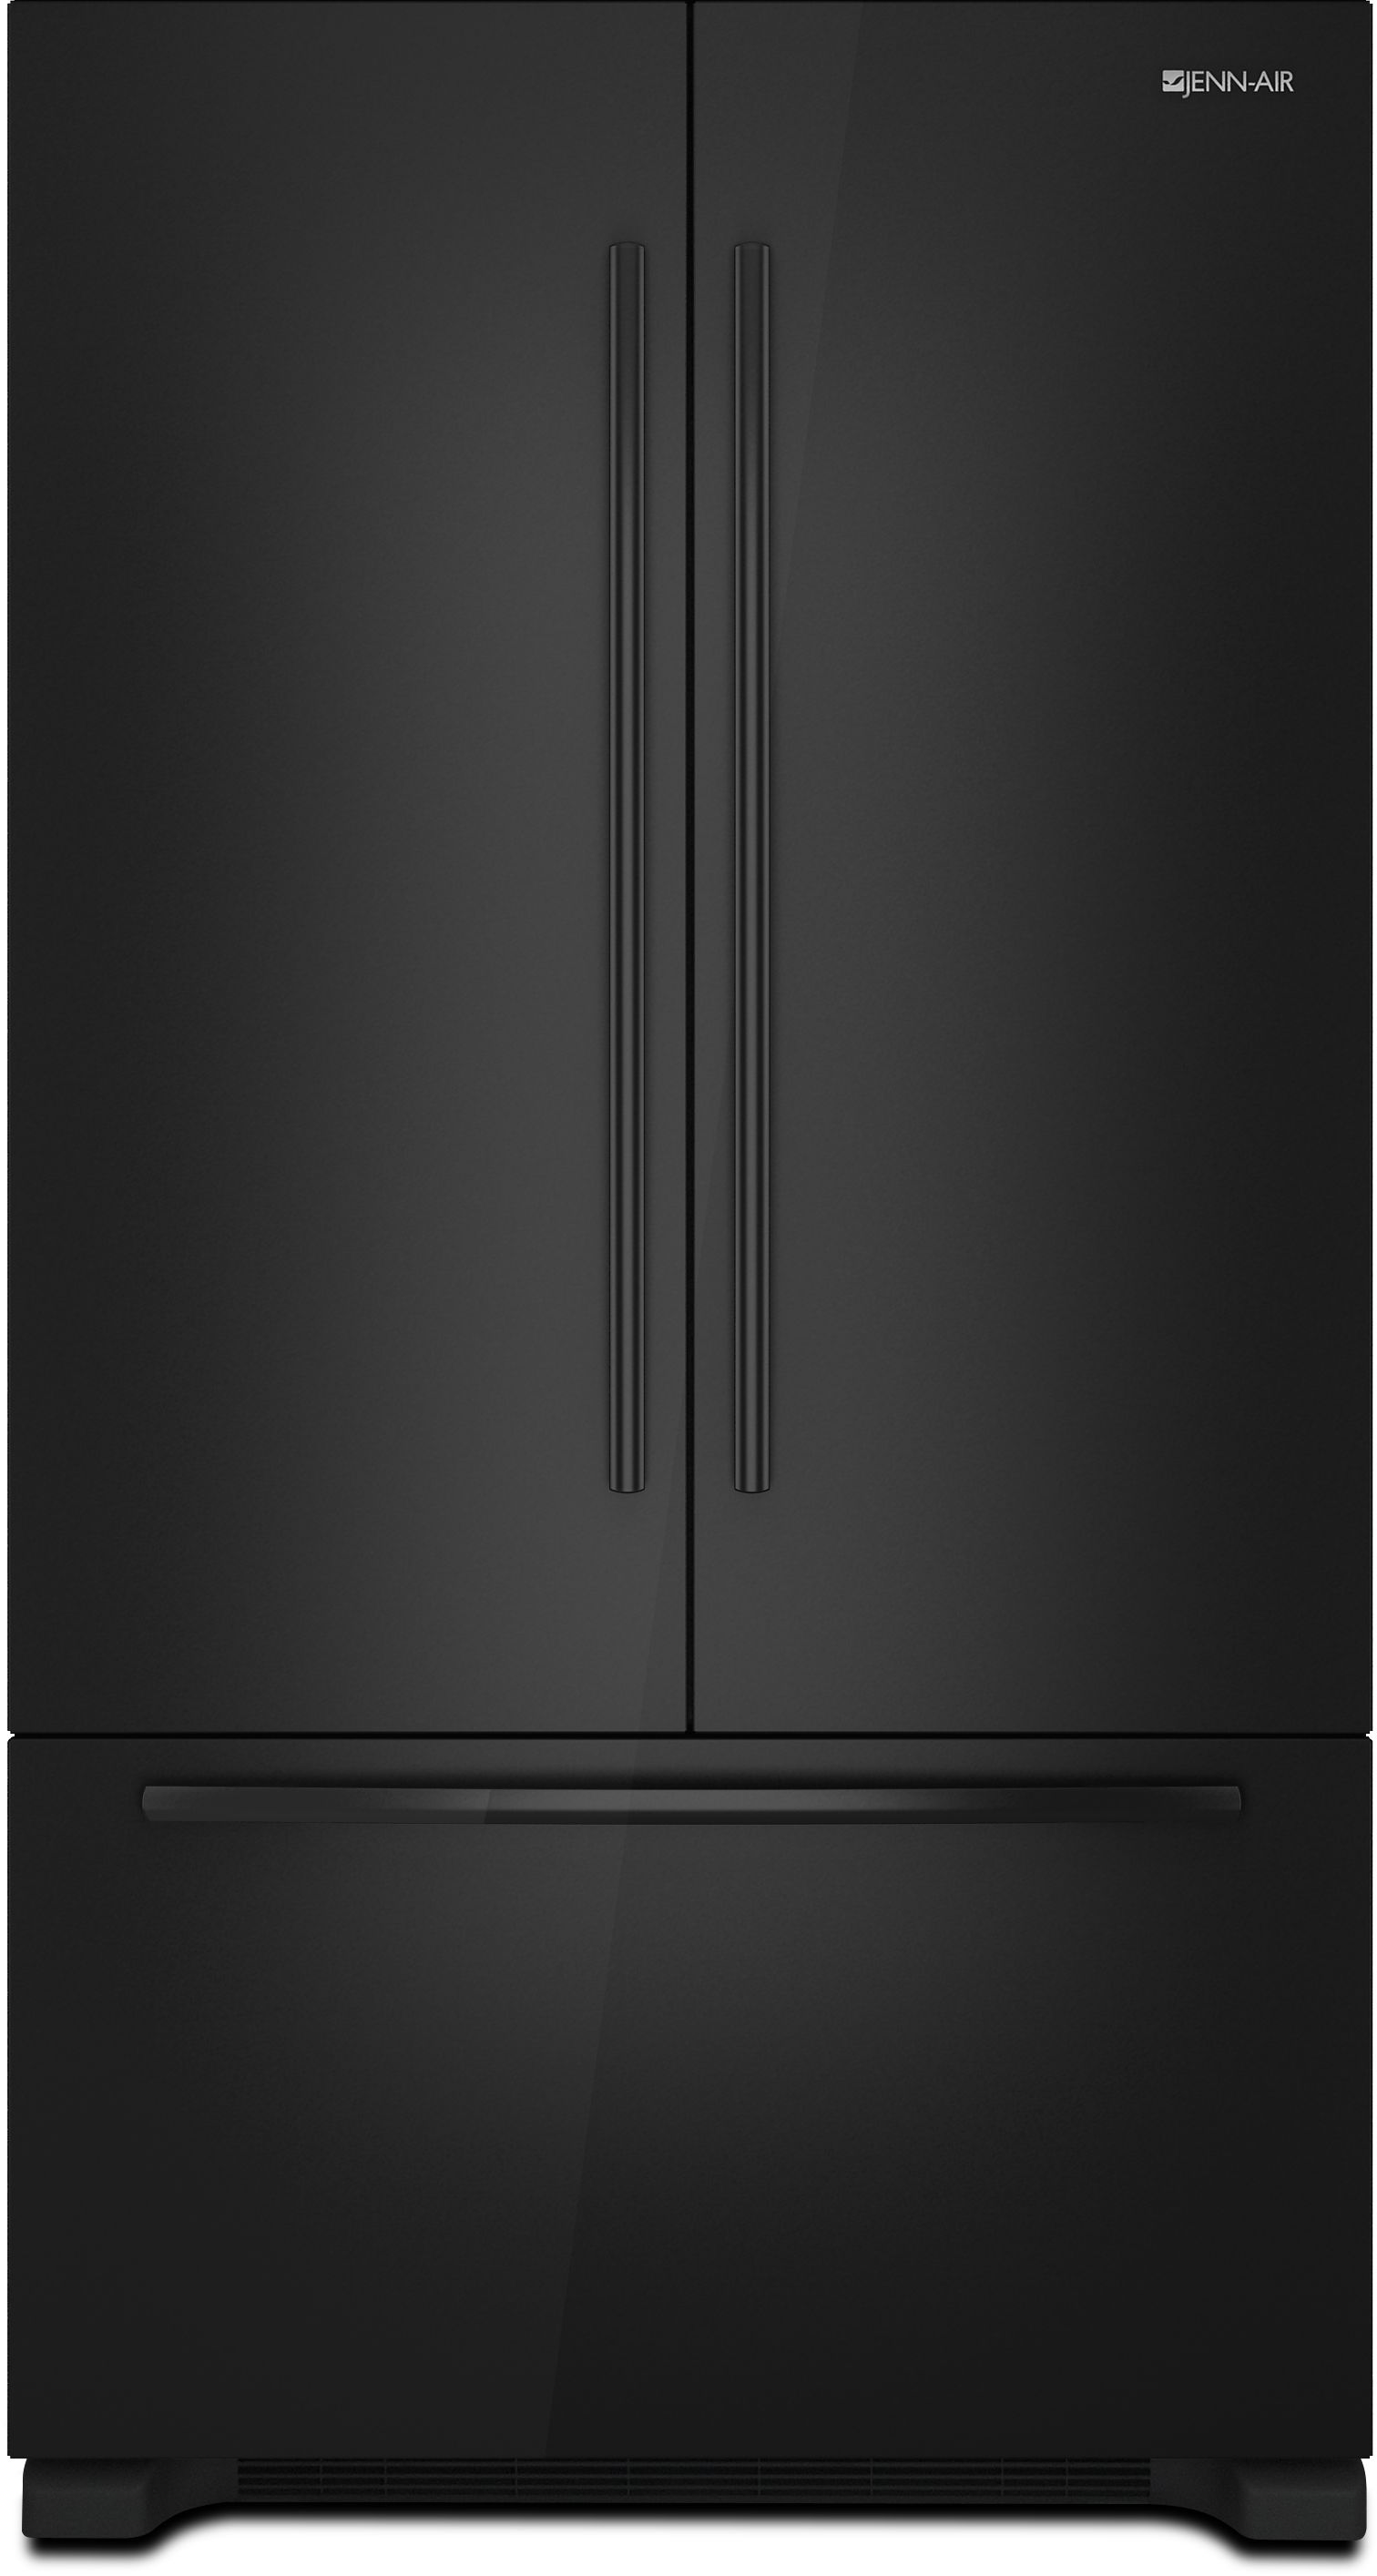 Jenn Air 219 Cu Ft Counter Depth French Door Refrigerator Black